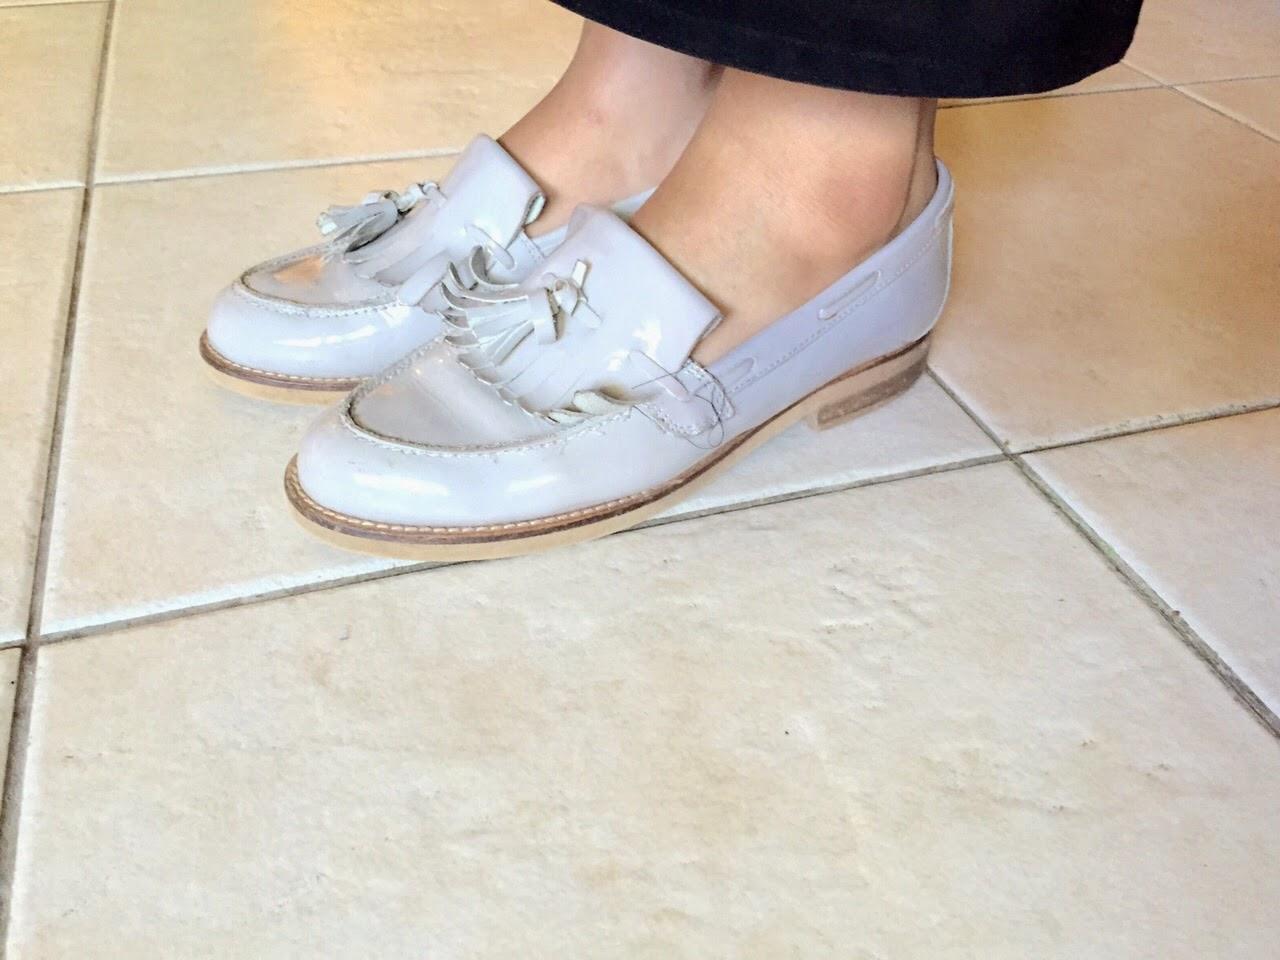 Shoes of Saudi Arabia photography project Al-Khobar Razan blog